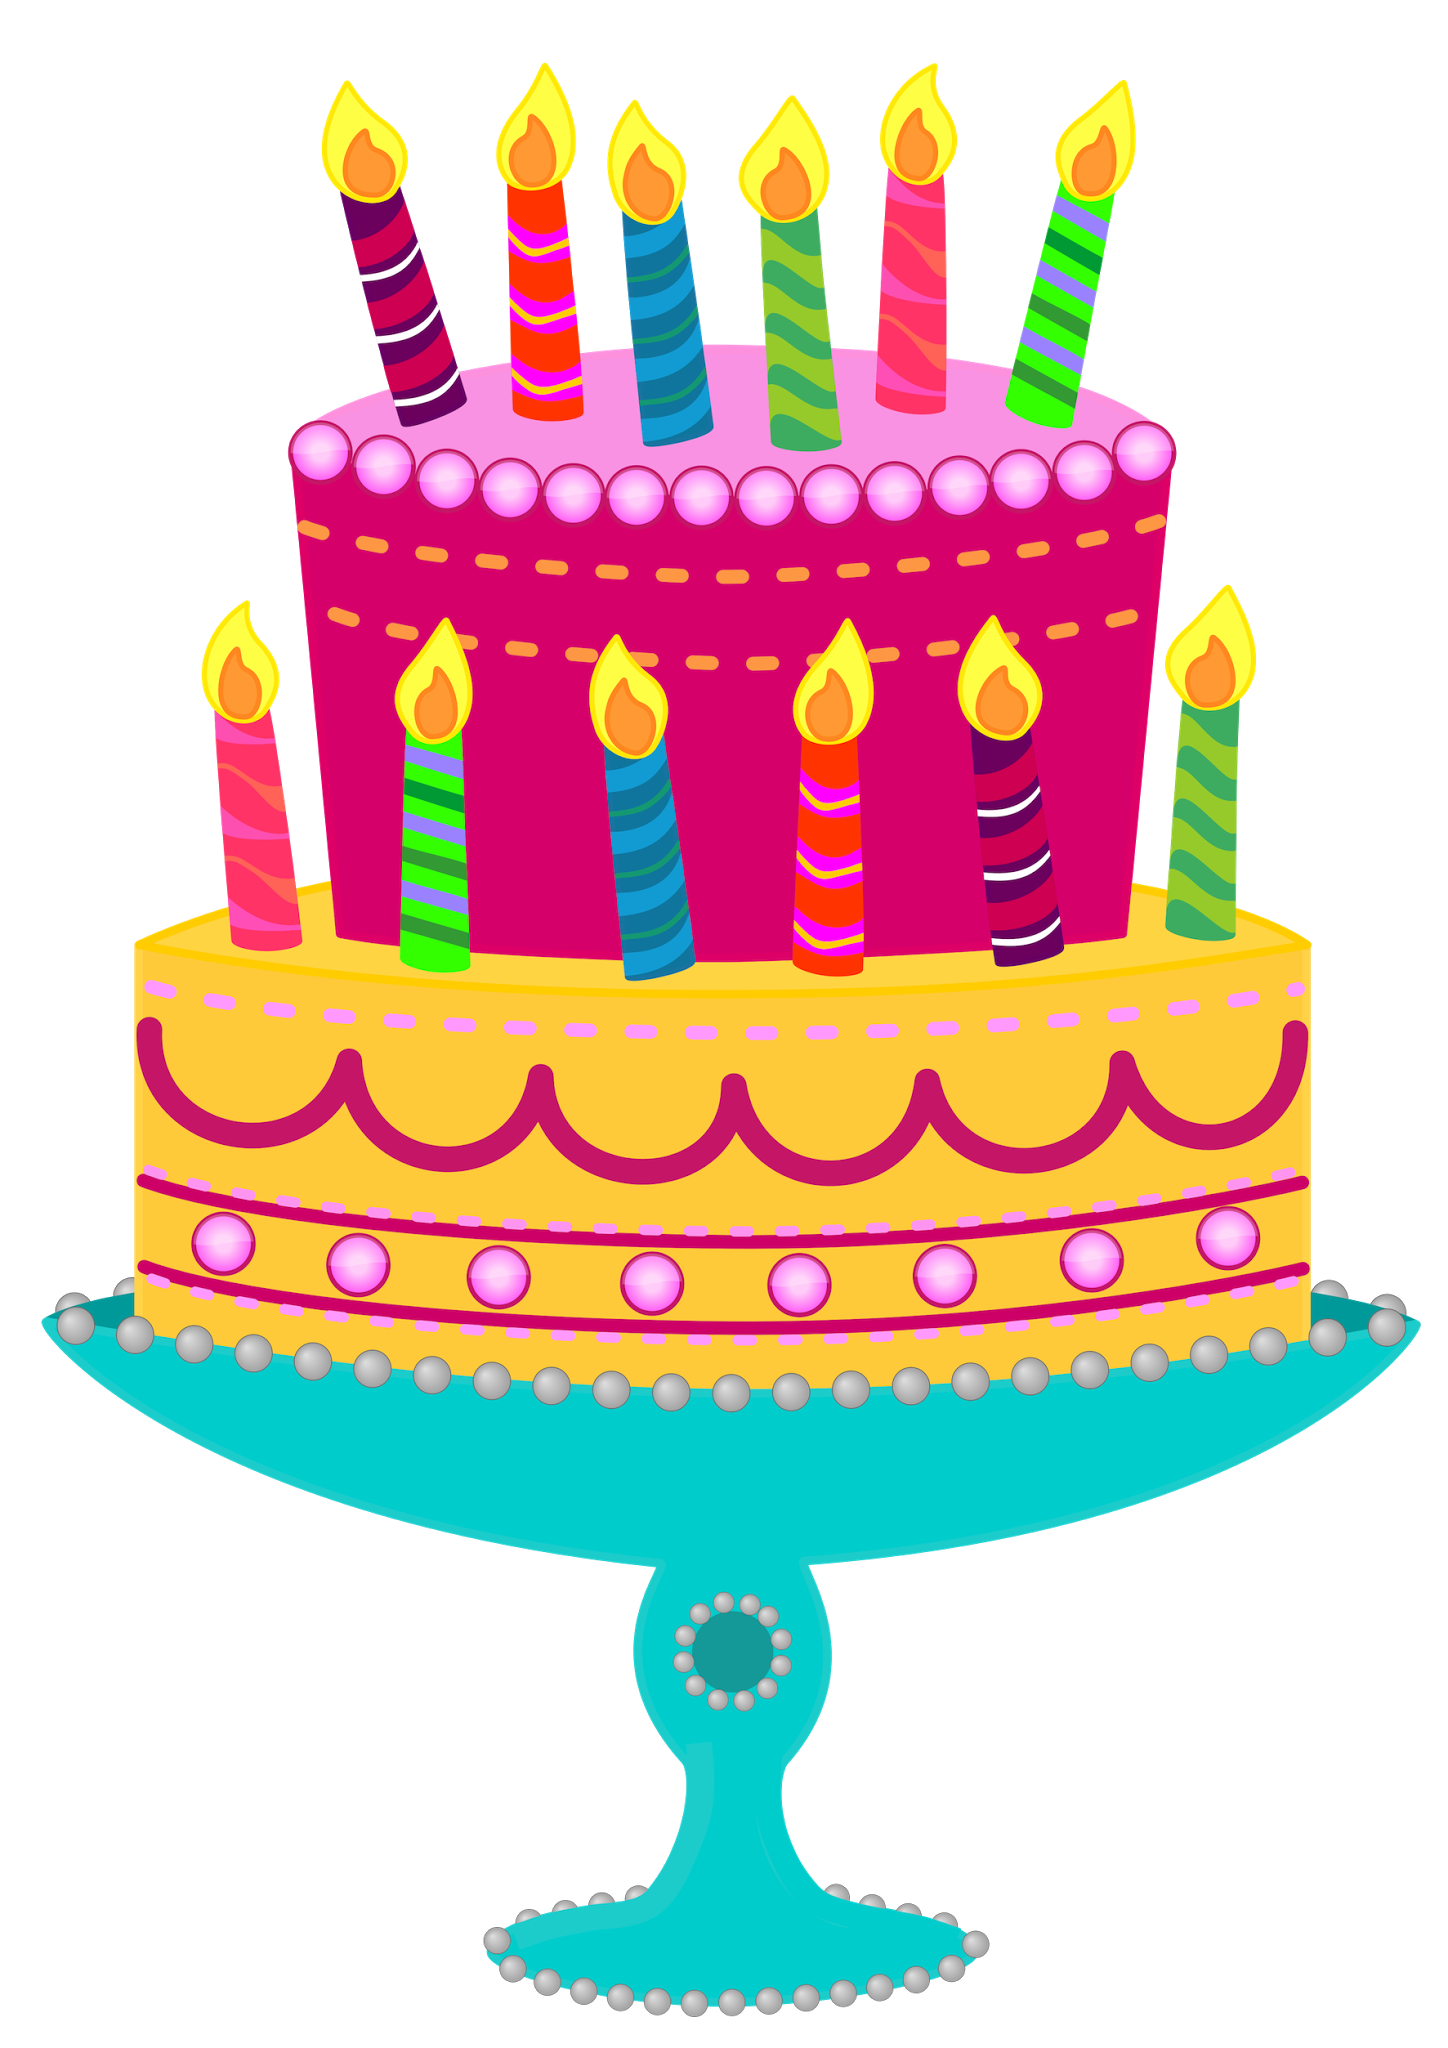 Free birthday animated birthd